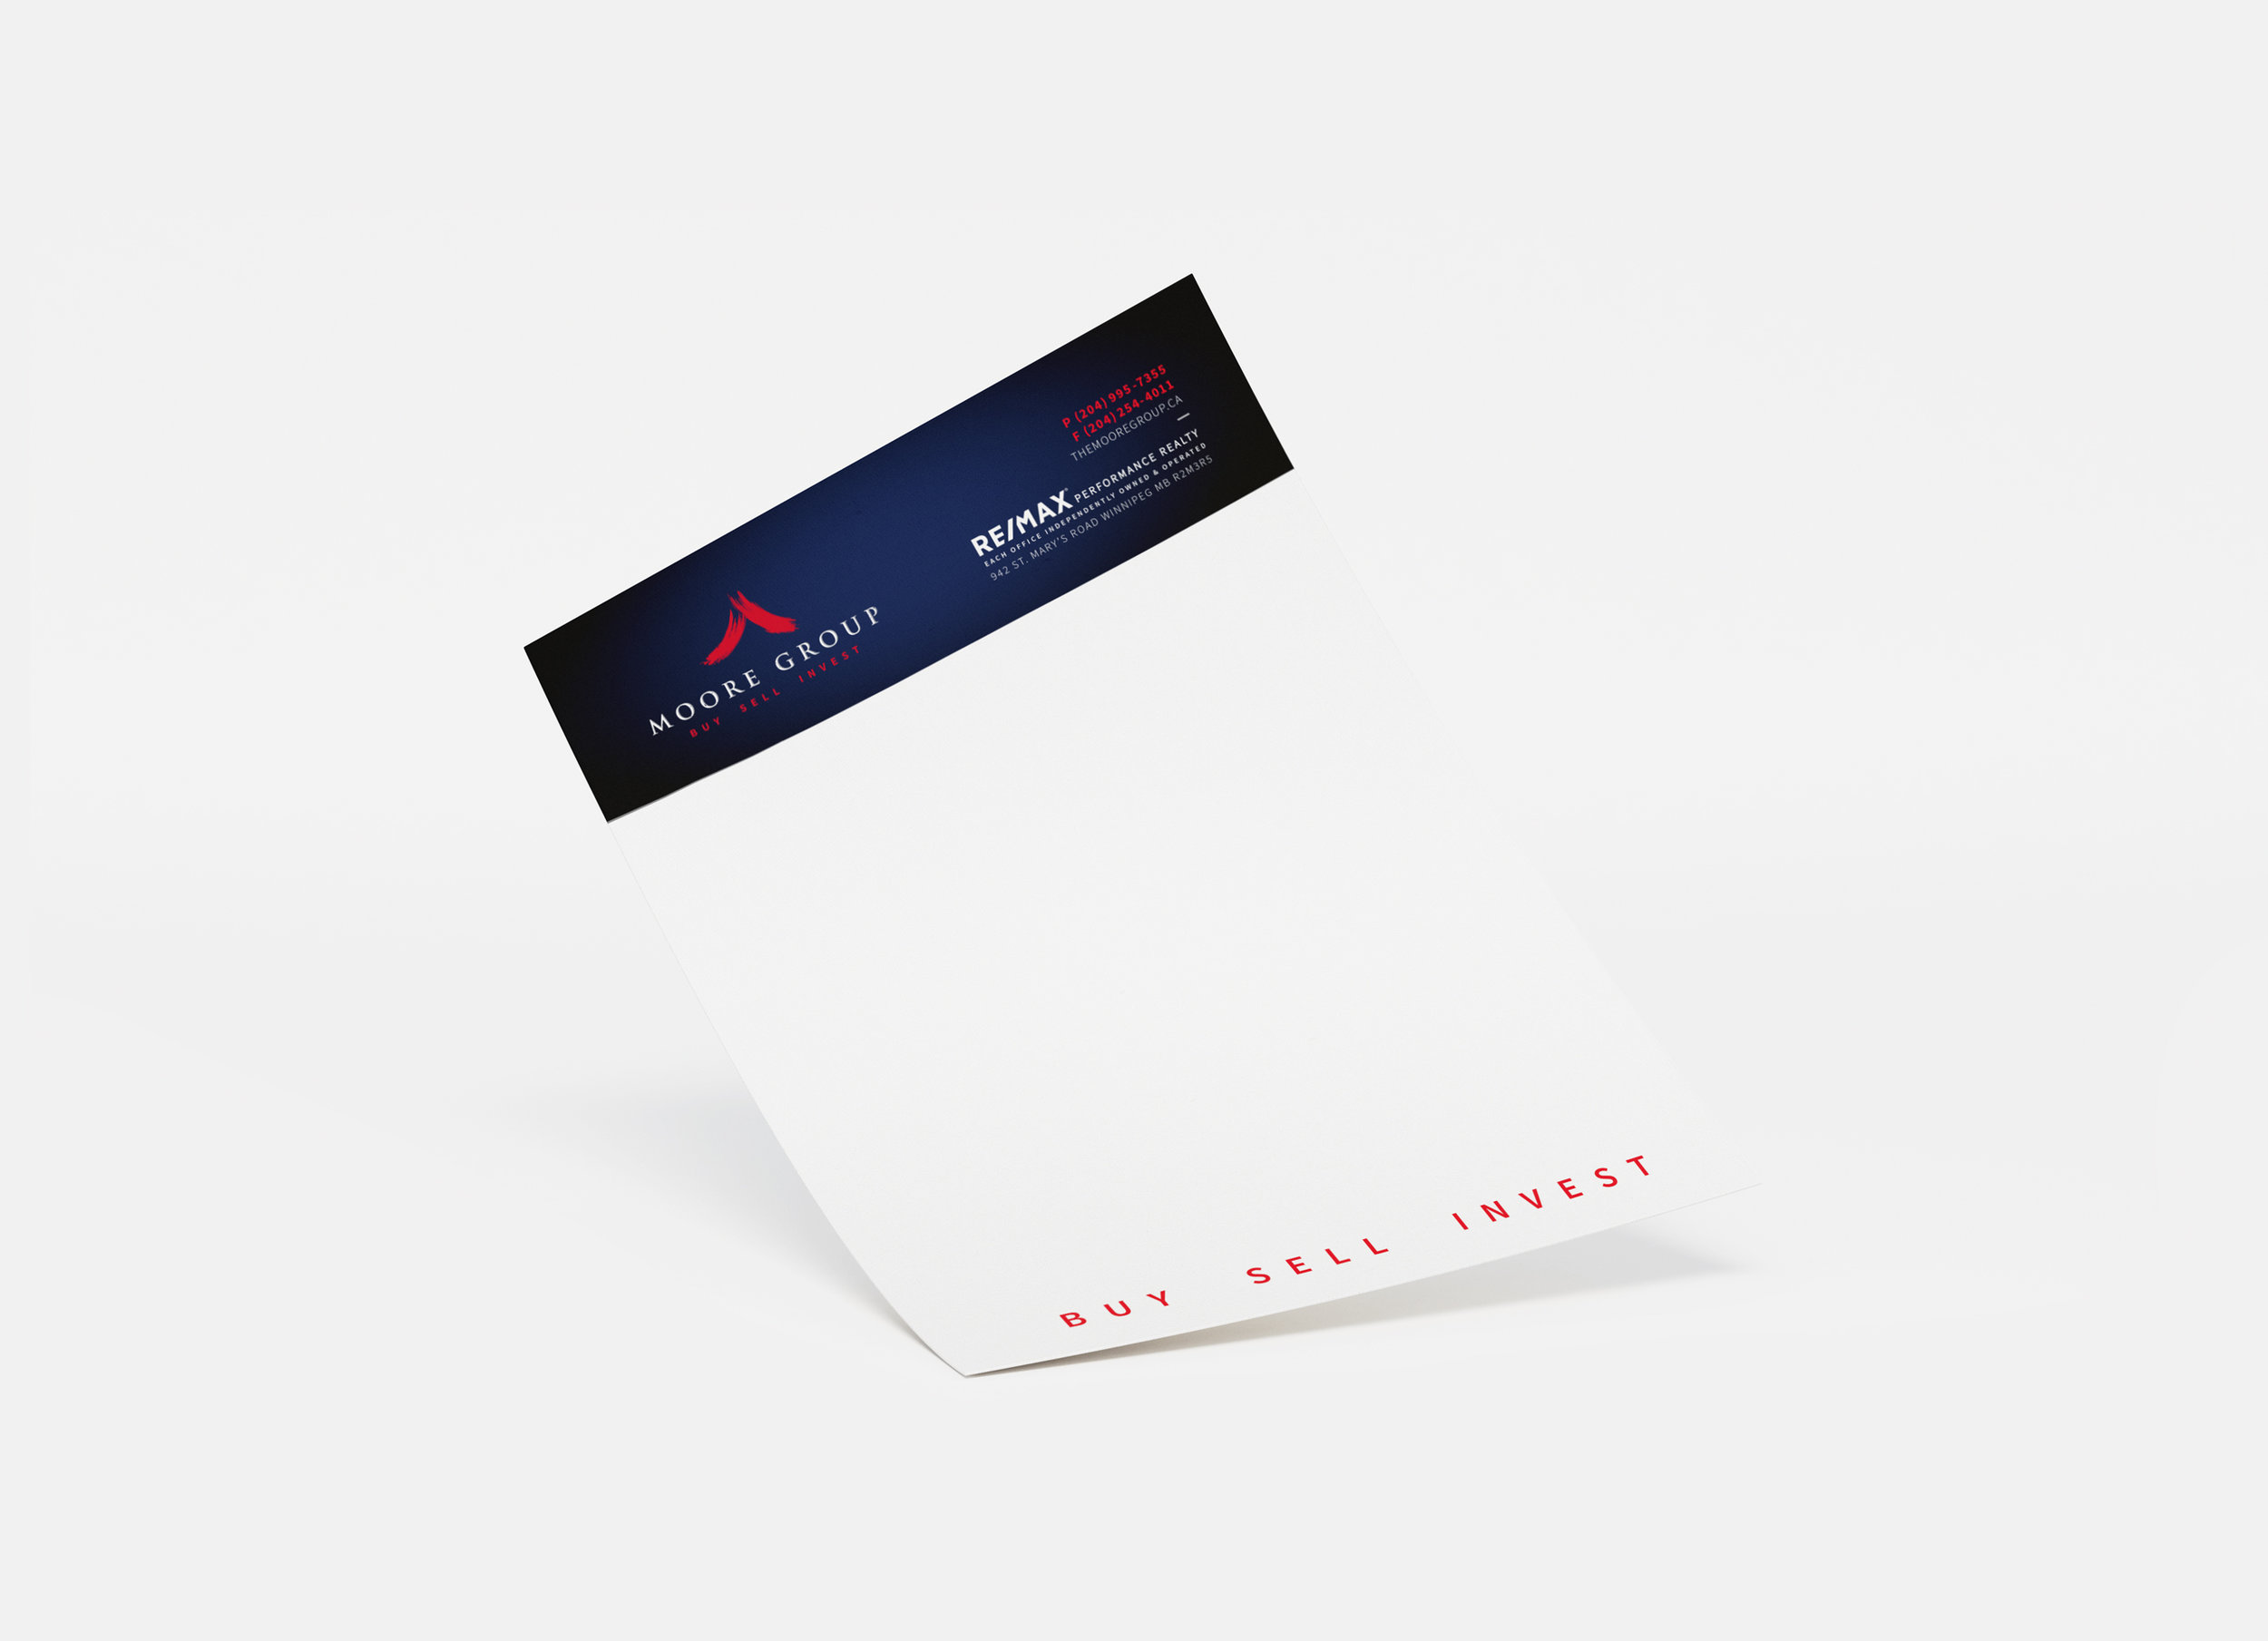 moore-group-winnipeg-remaz-team-branding-design-logo-letterhead-clover-and-crow